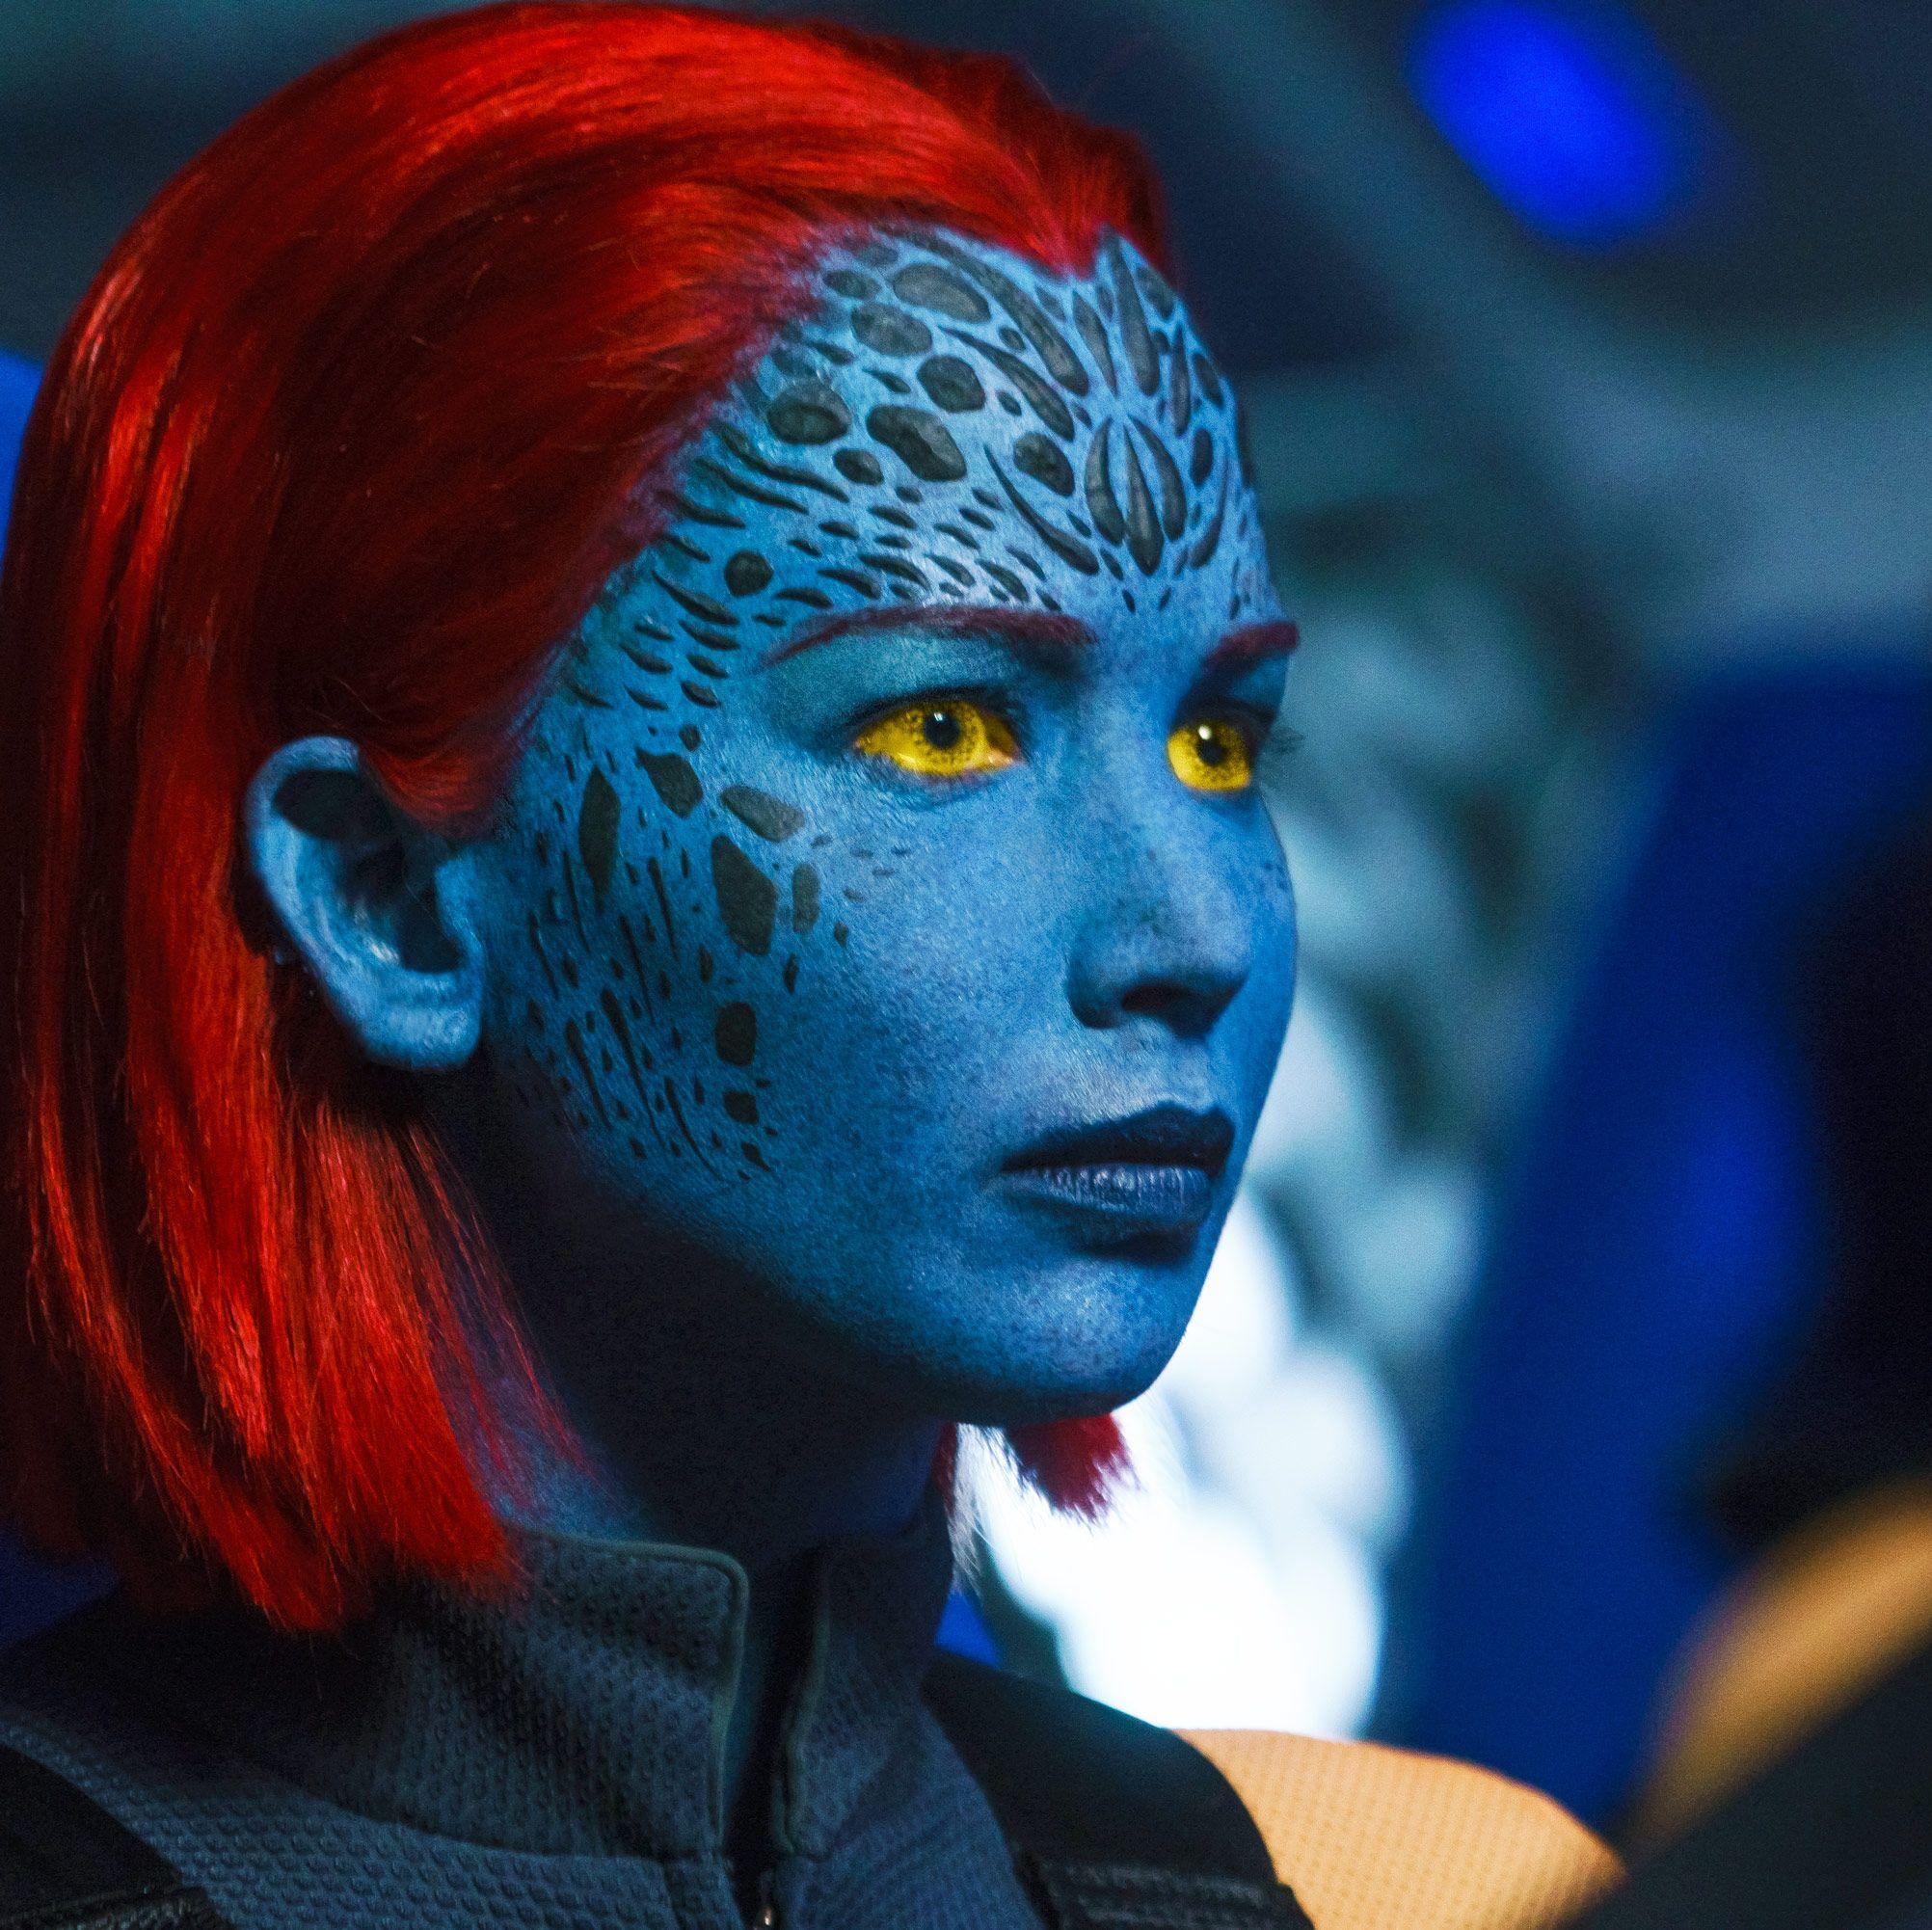 Dark Phoenix Mystique Why Has X Men Dark Phoenix Spoiled Its Own